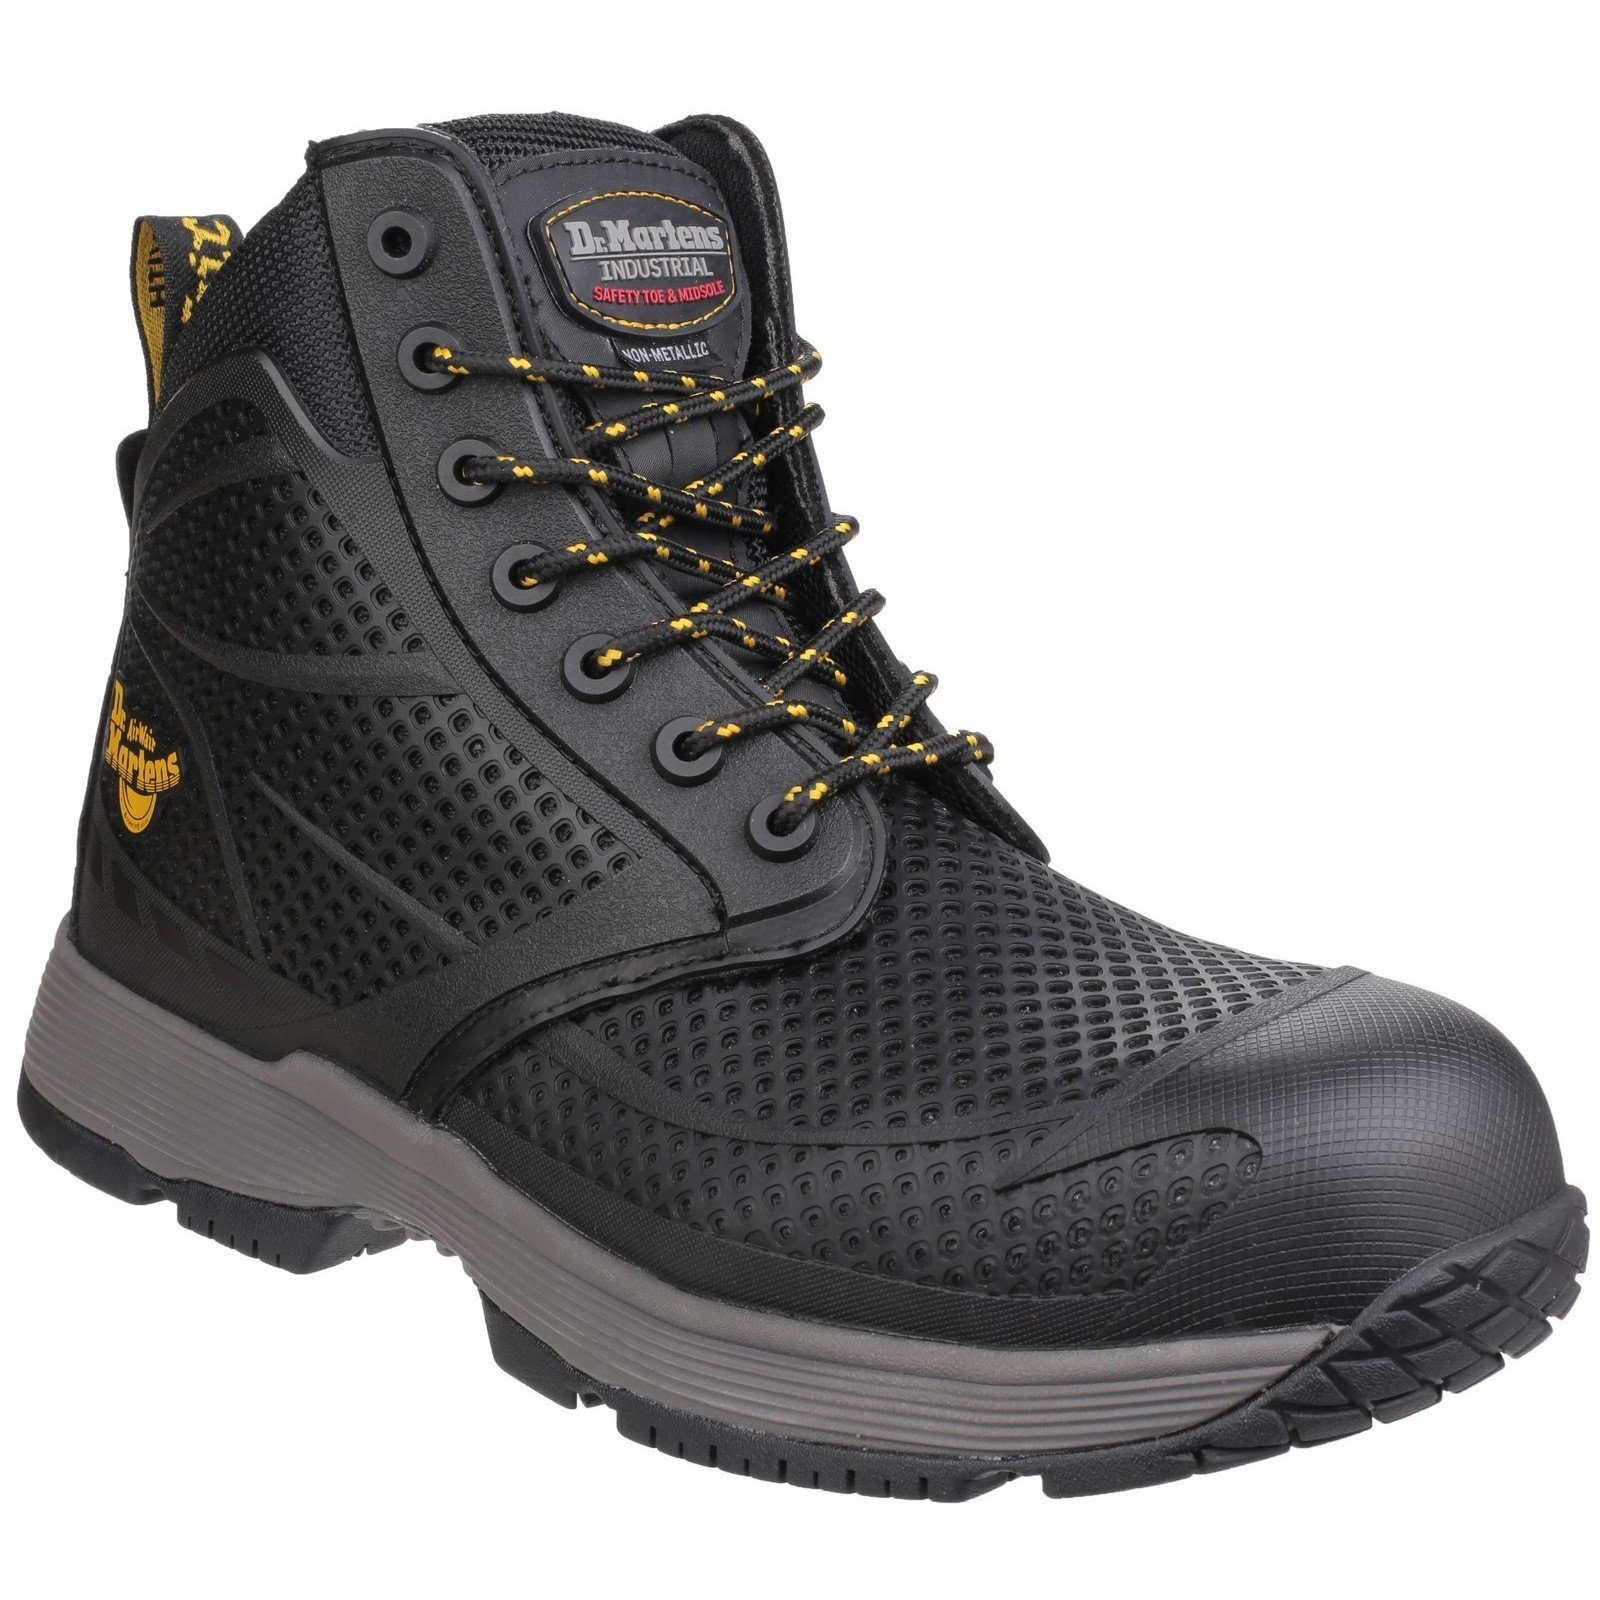 Dr Martens Unisex Calamus Lace up Safety Boot Black 24535-40574 - Black 12